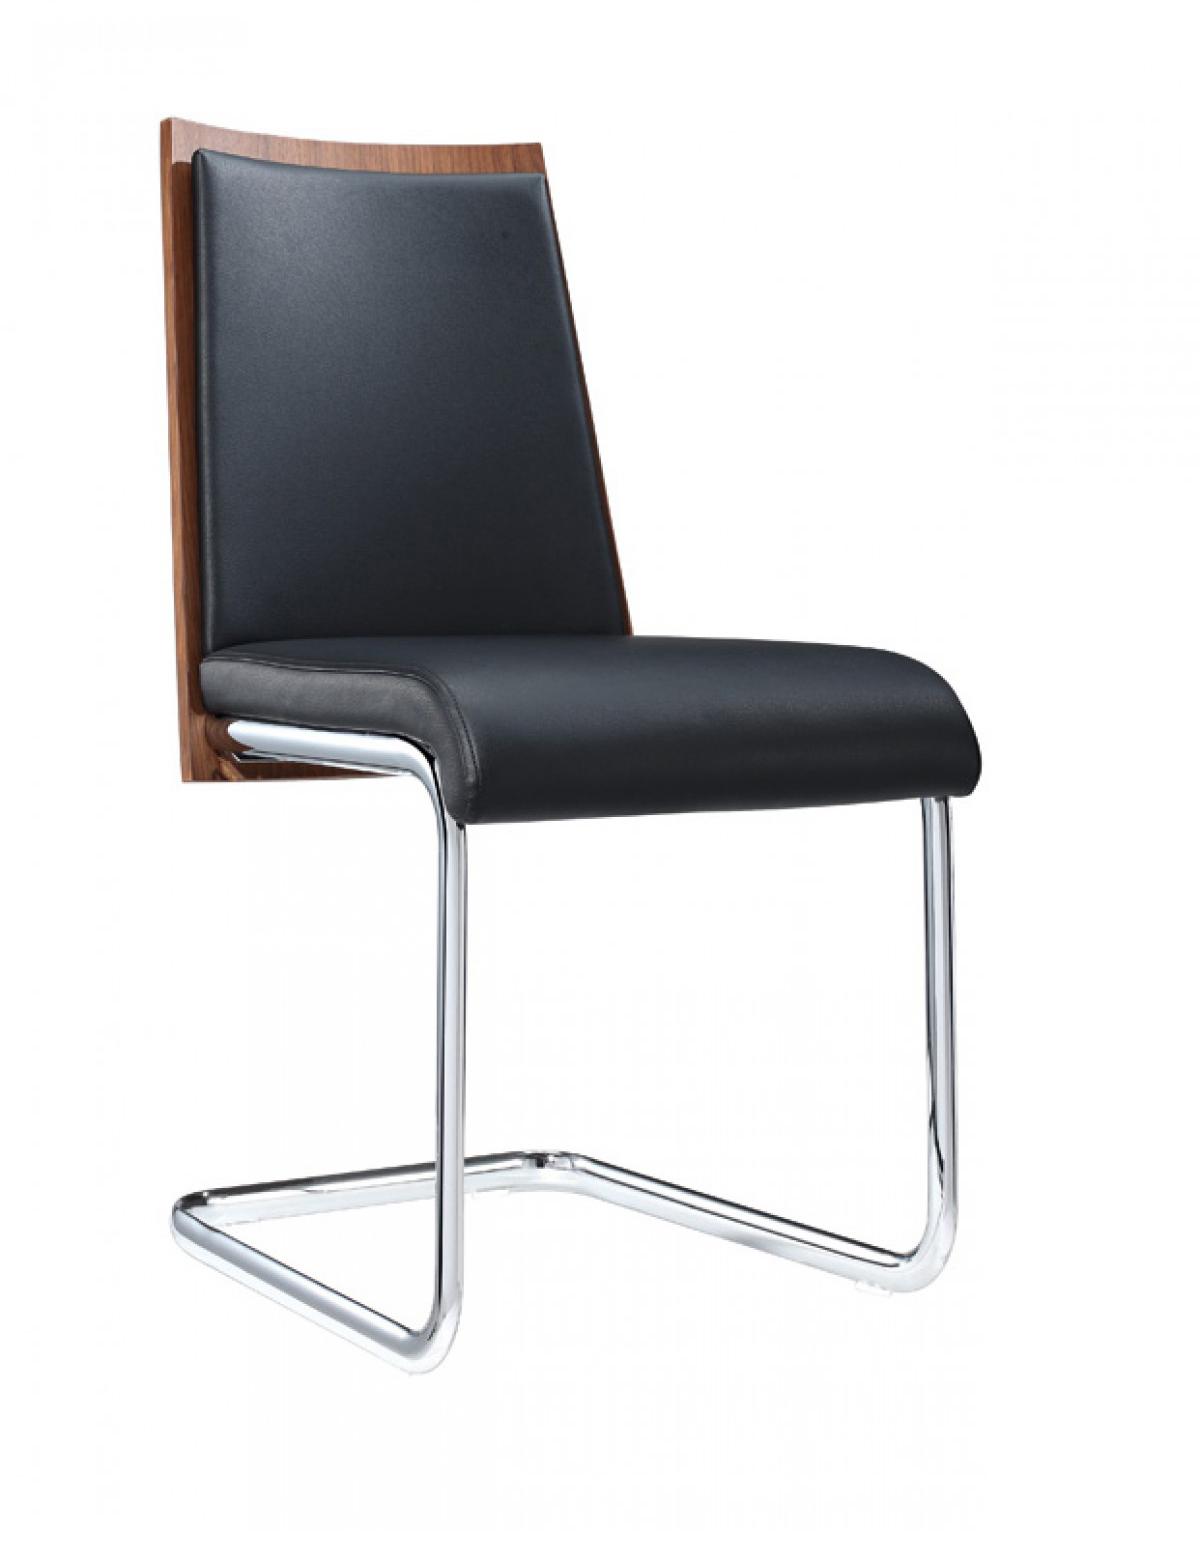 Brand new Milo Black modern Dining Chair available at AdvancedInteriorDesigns.com